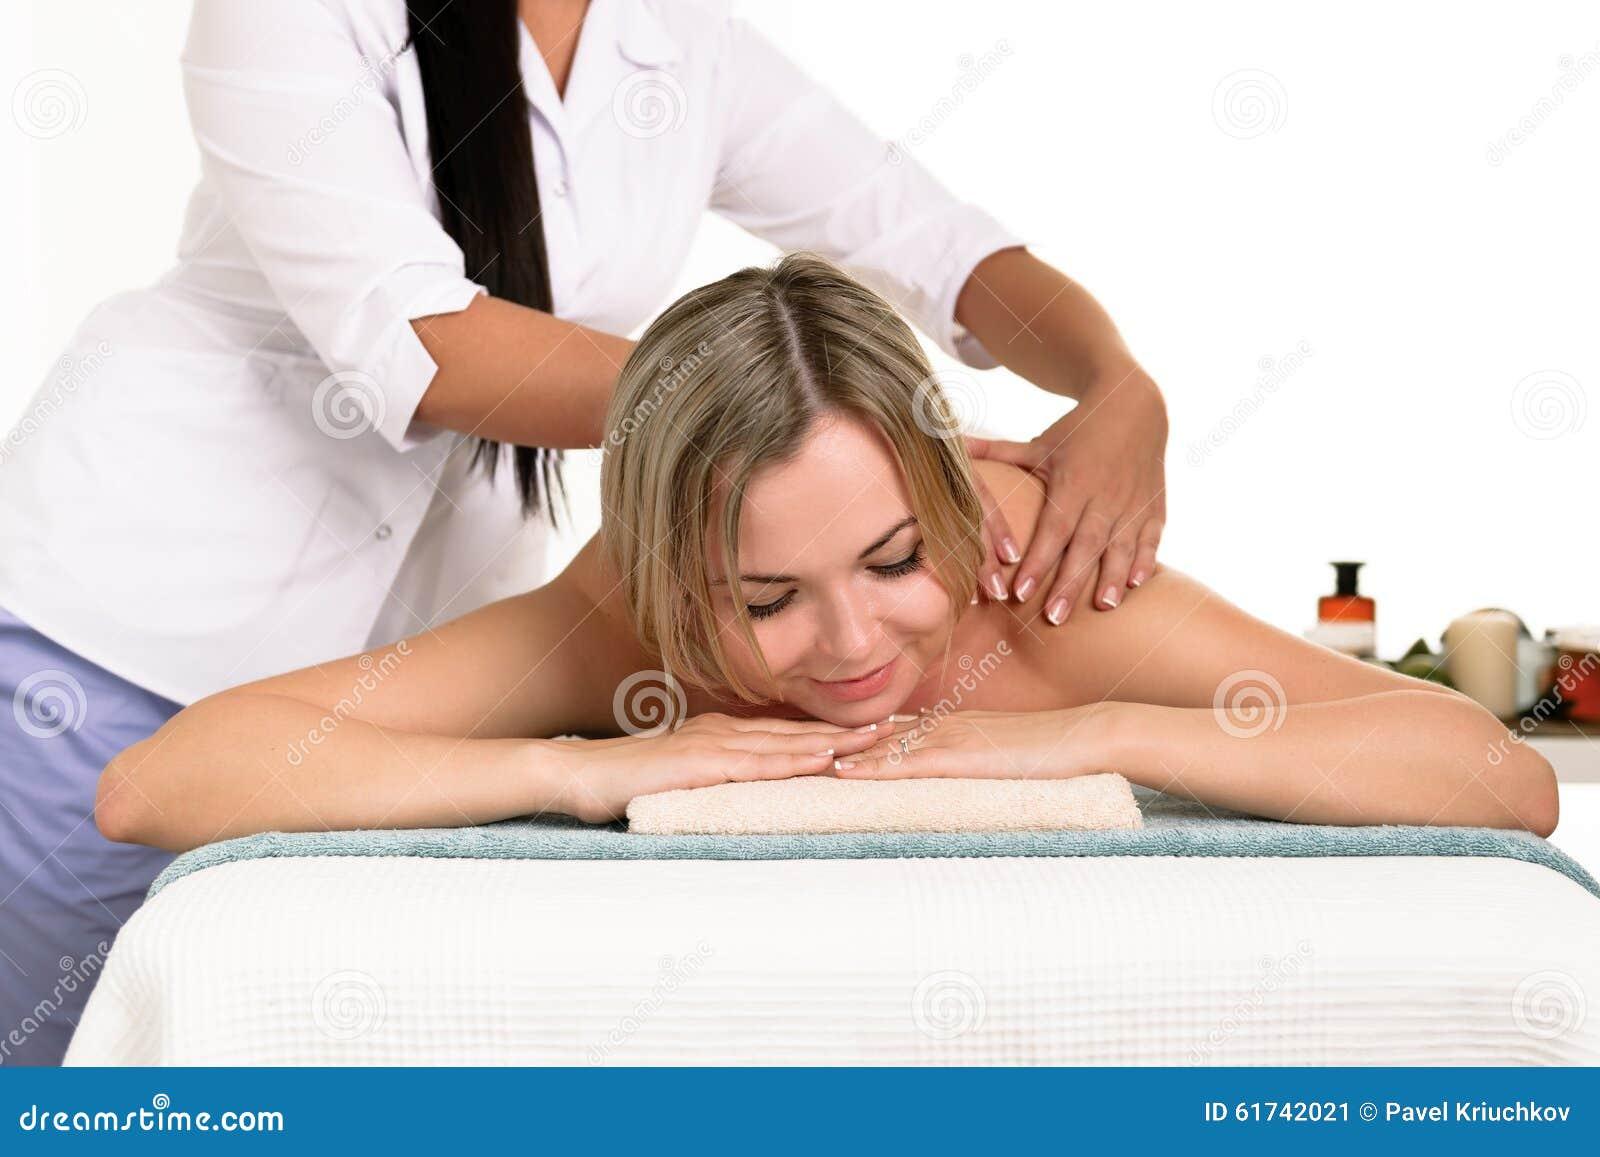 tantra massage salon mooie vrouw